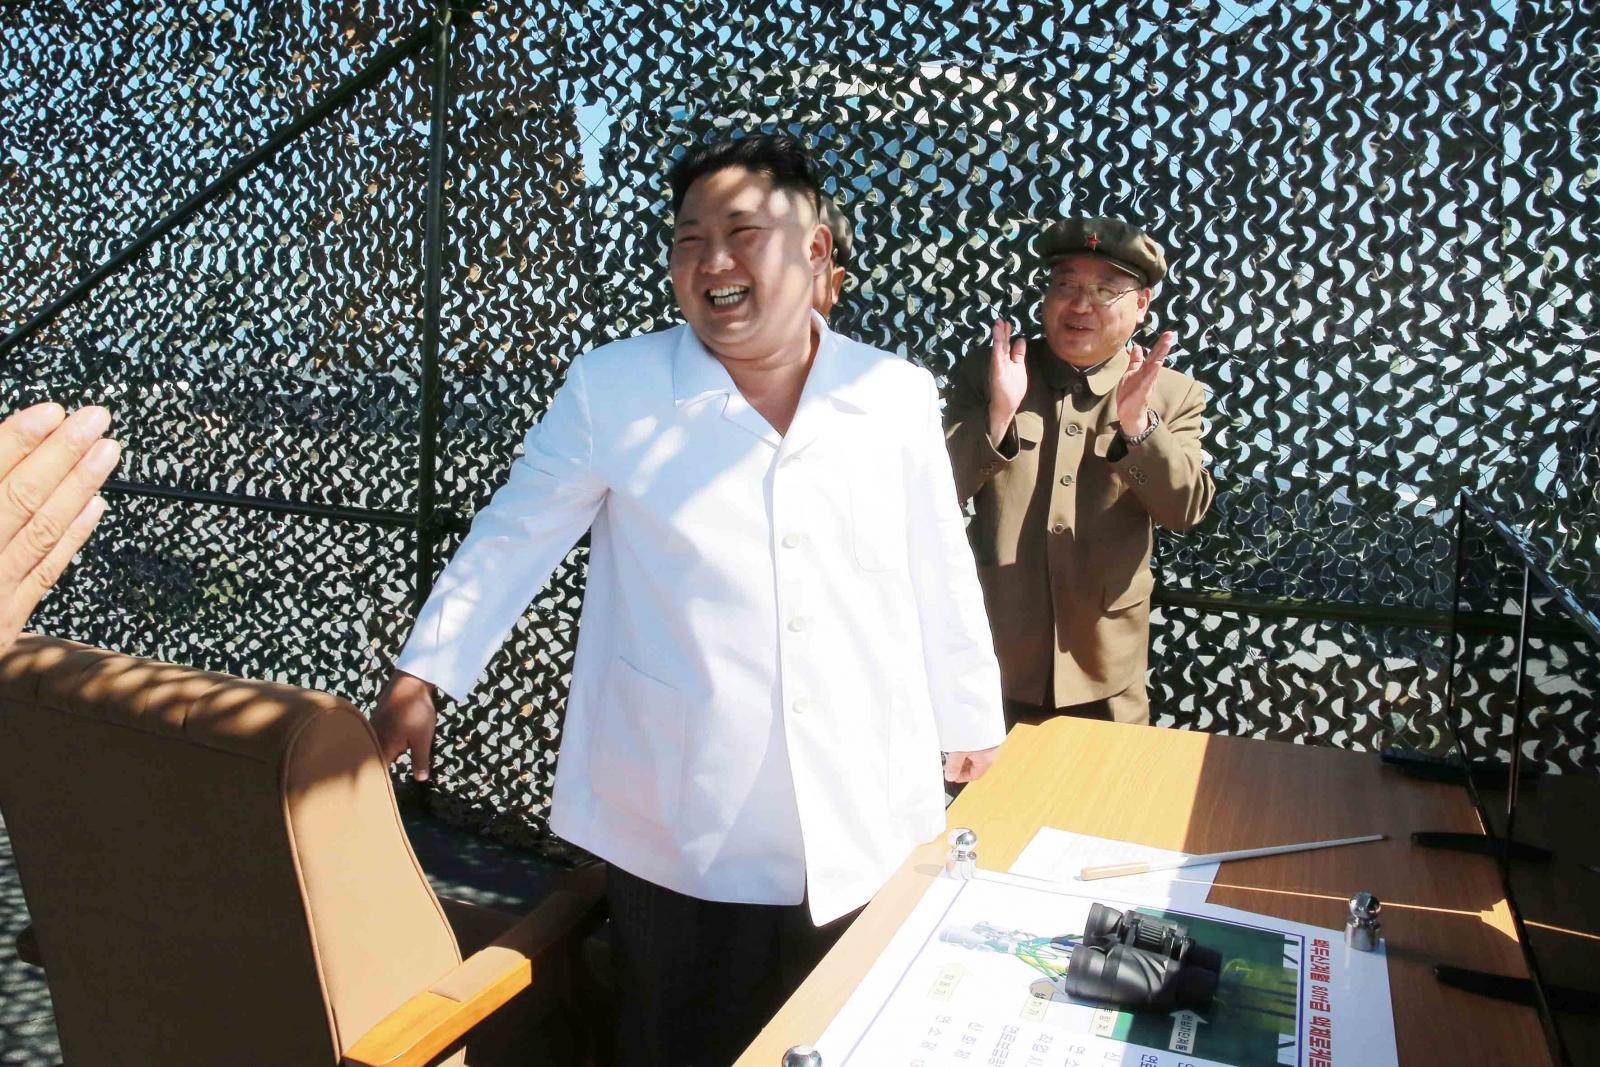 North Korea main space facility upgrades